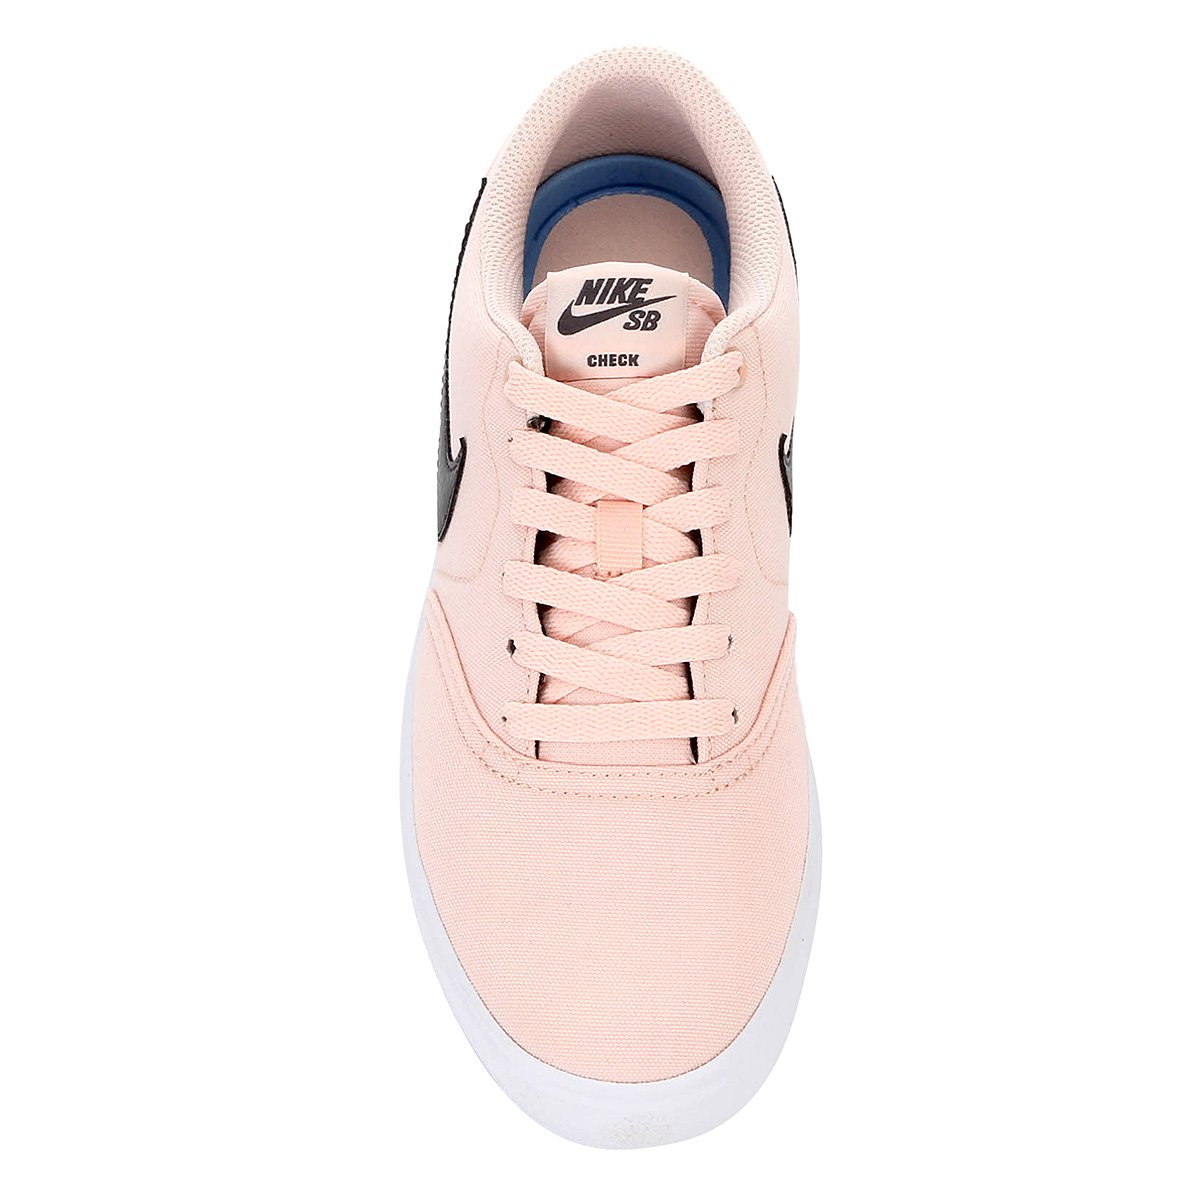 549714fb6 Tênis Nike Wmns Sb Check Solar Cnvs Feminino - Tam: 35 - Shopping ...